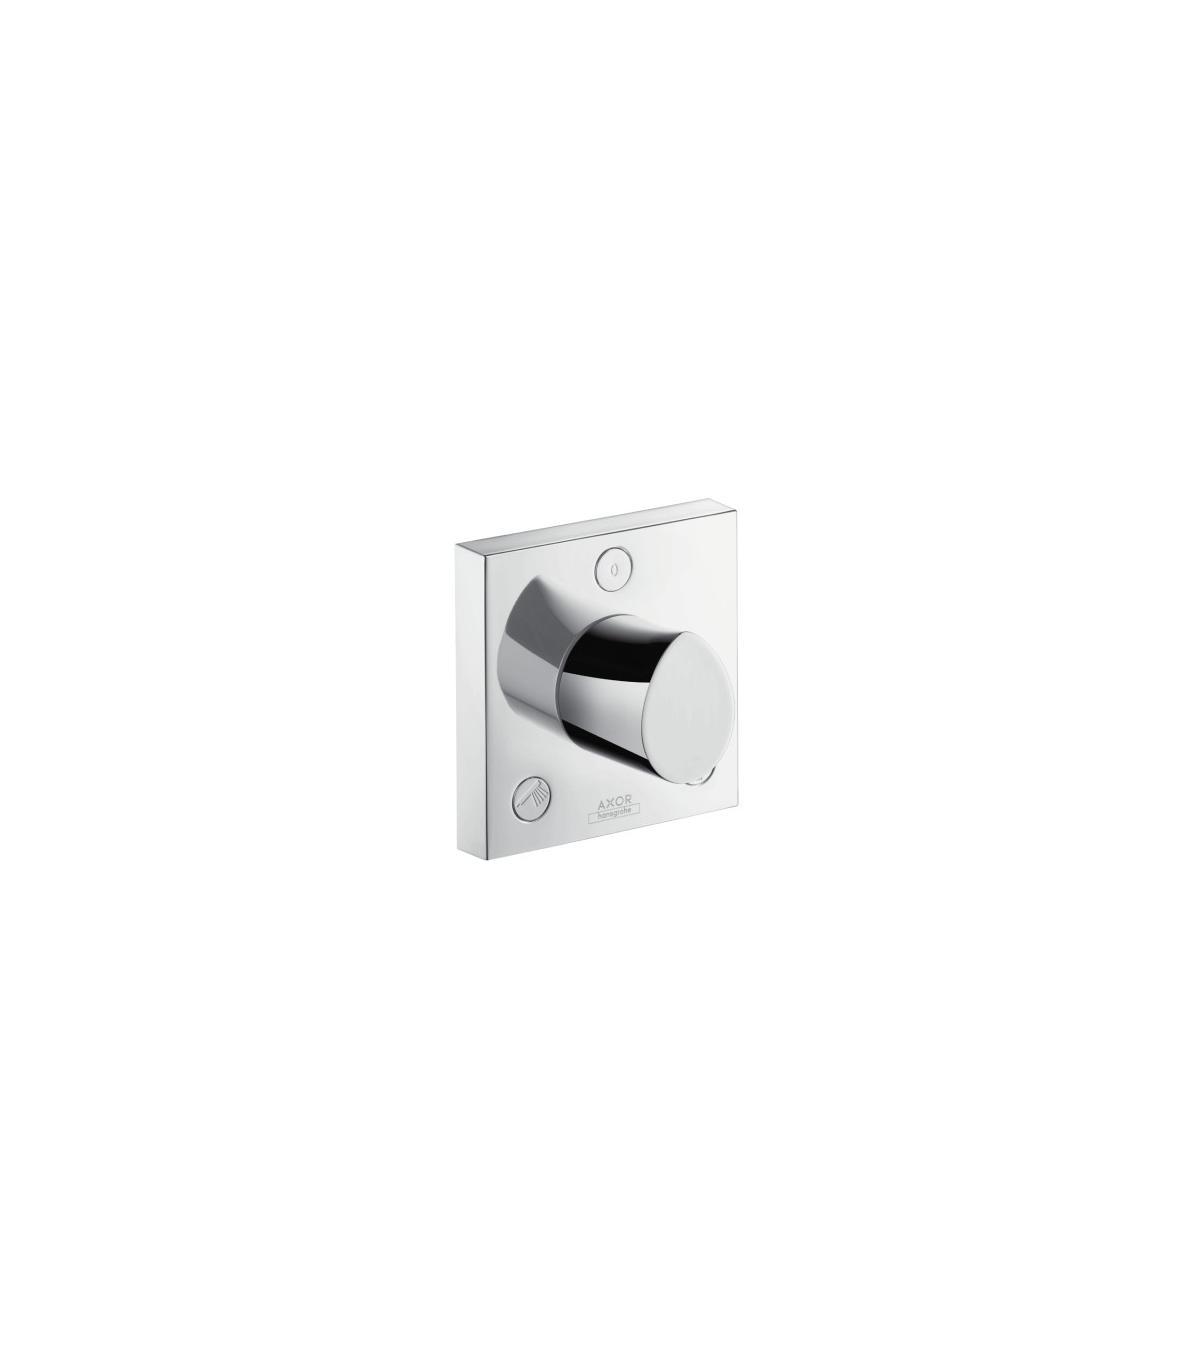 Sedile Wc Disabili Ideal Standard.Vaso Wc Filoparete Ideal Standard Tesi Aquablade Con Sedile Slim